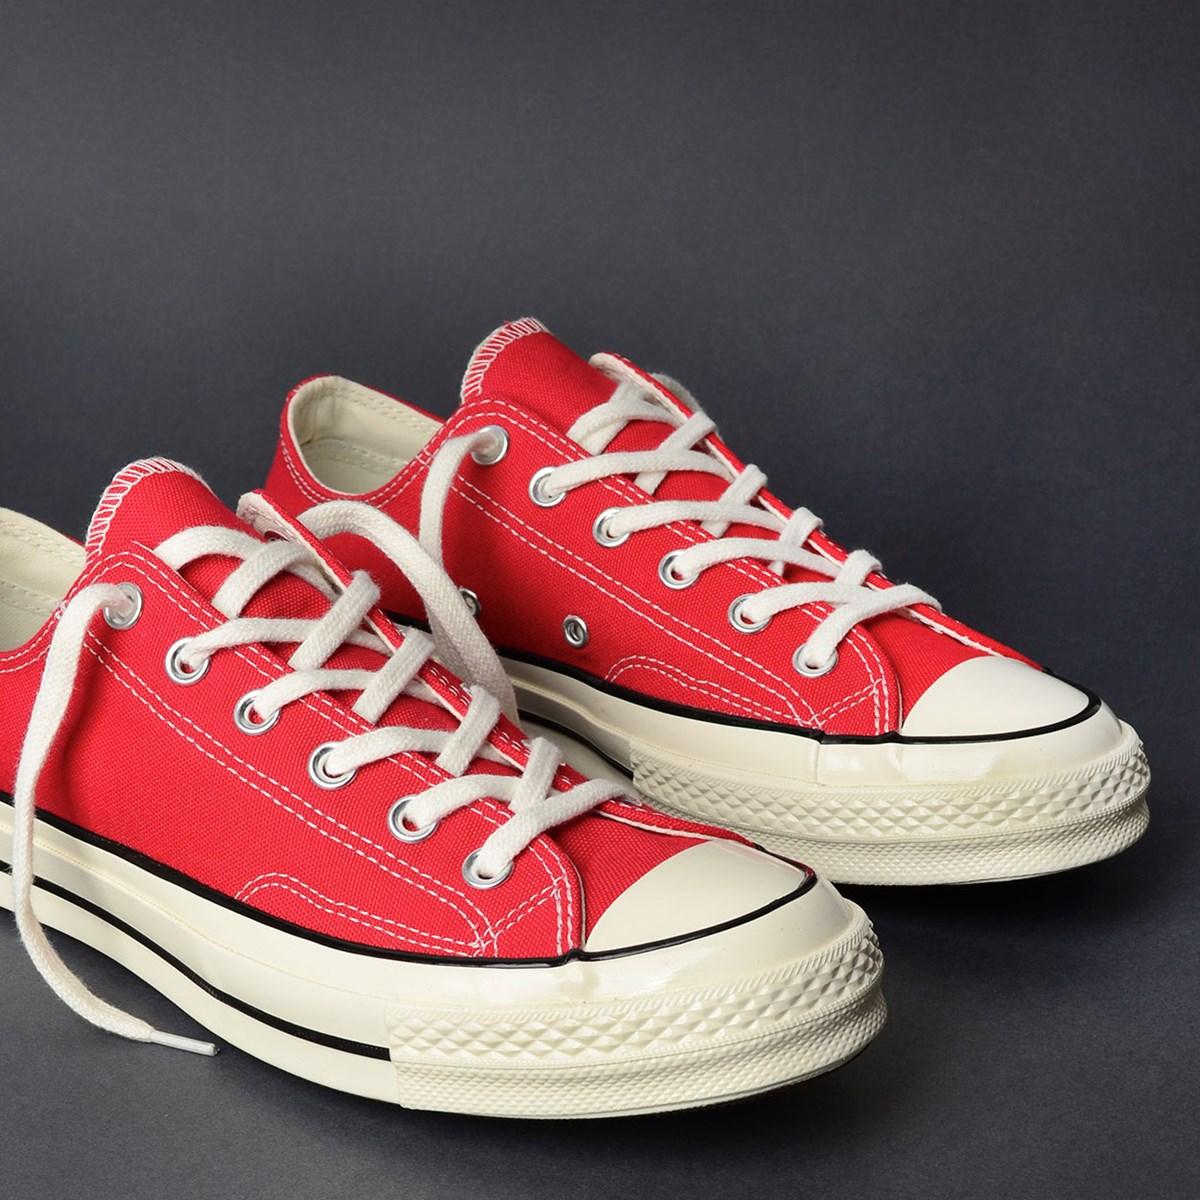 Tênis Converse Chuck 70 Ox Enamel Red 164949C